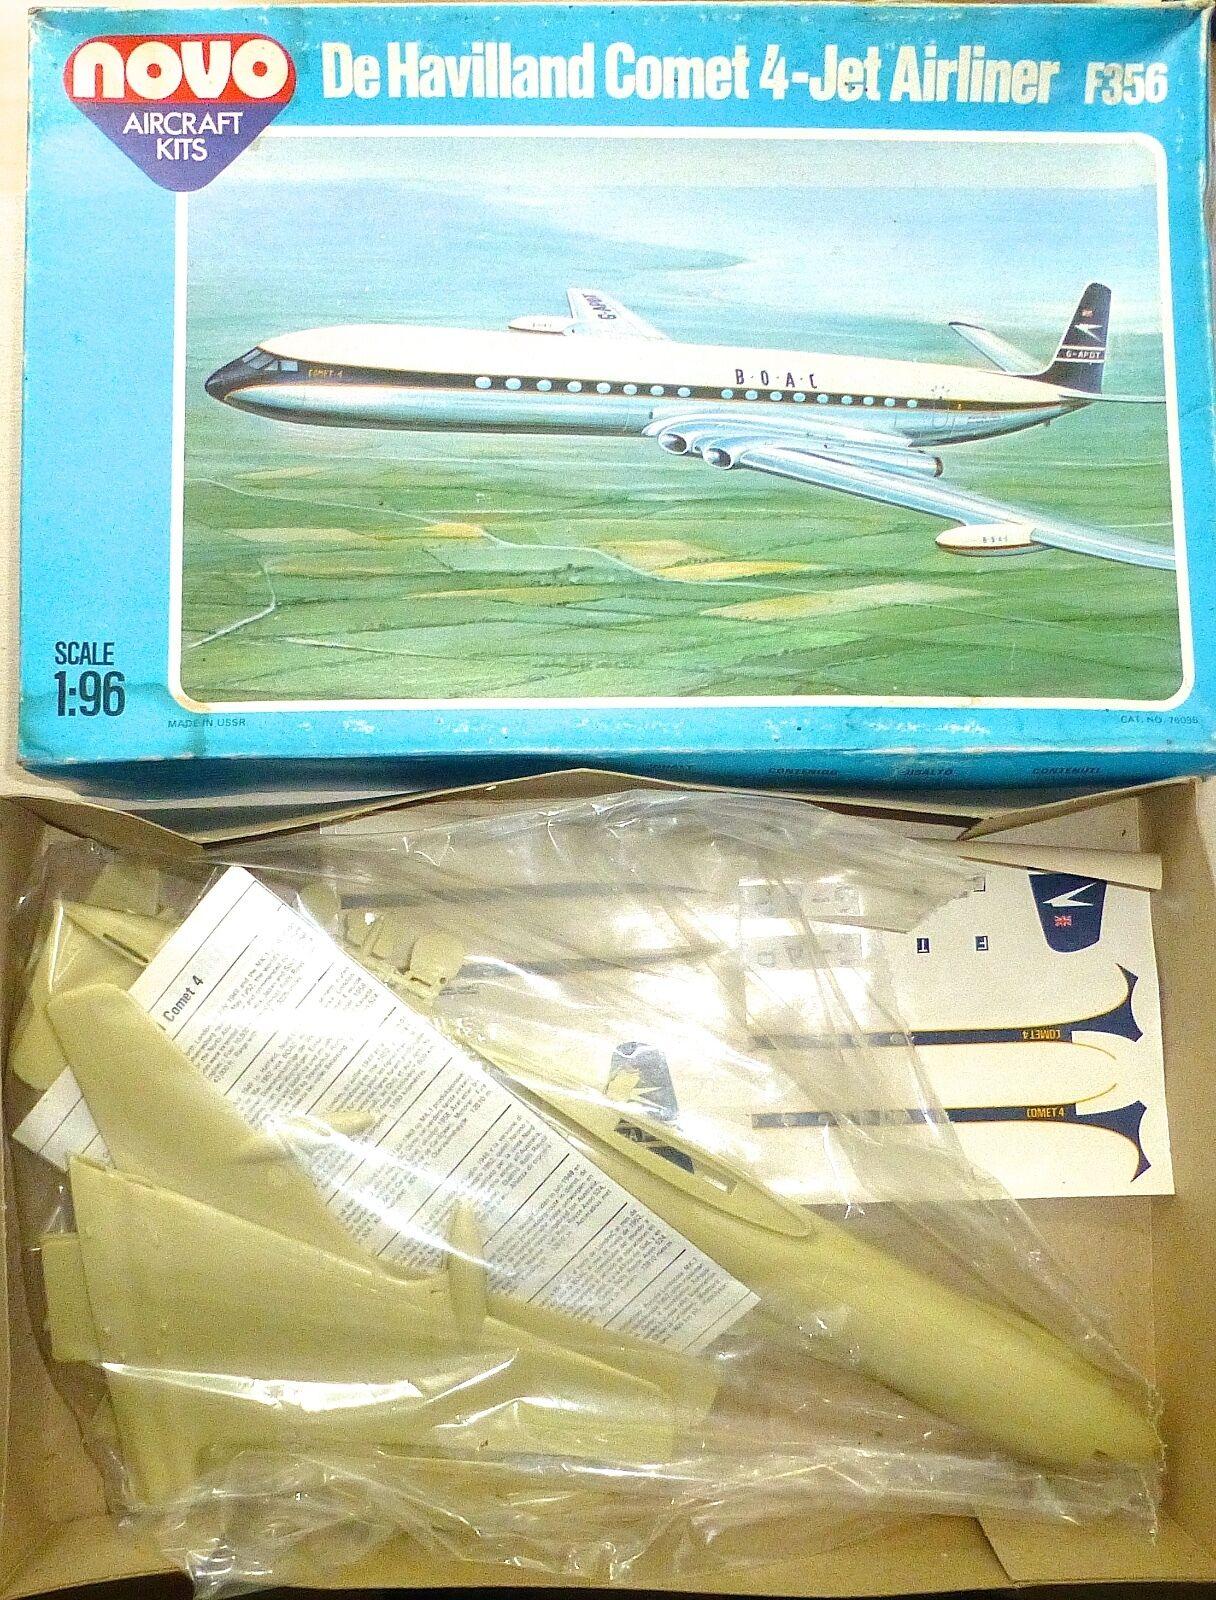 Havilland 4 Jet Airliner F356 Novo Aircraft Kits 1 96 Rebuilt Kit Å